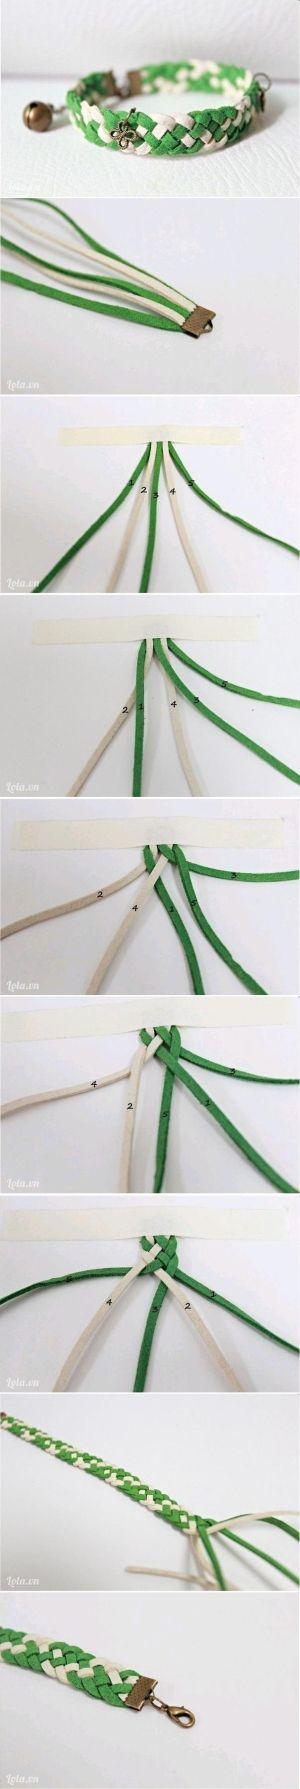 DIY Nice Braided Bracelet DIY Nice Braided Bracelet by diyforever